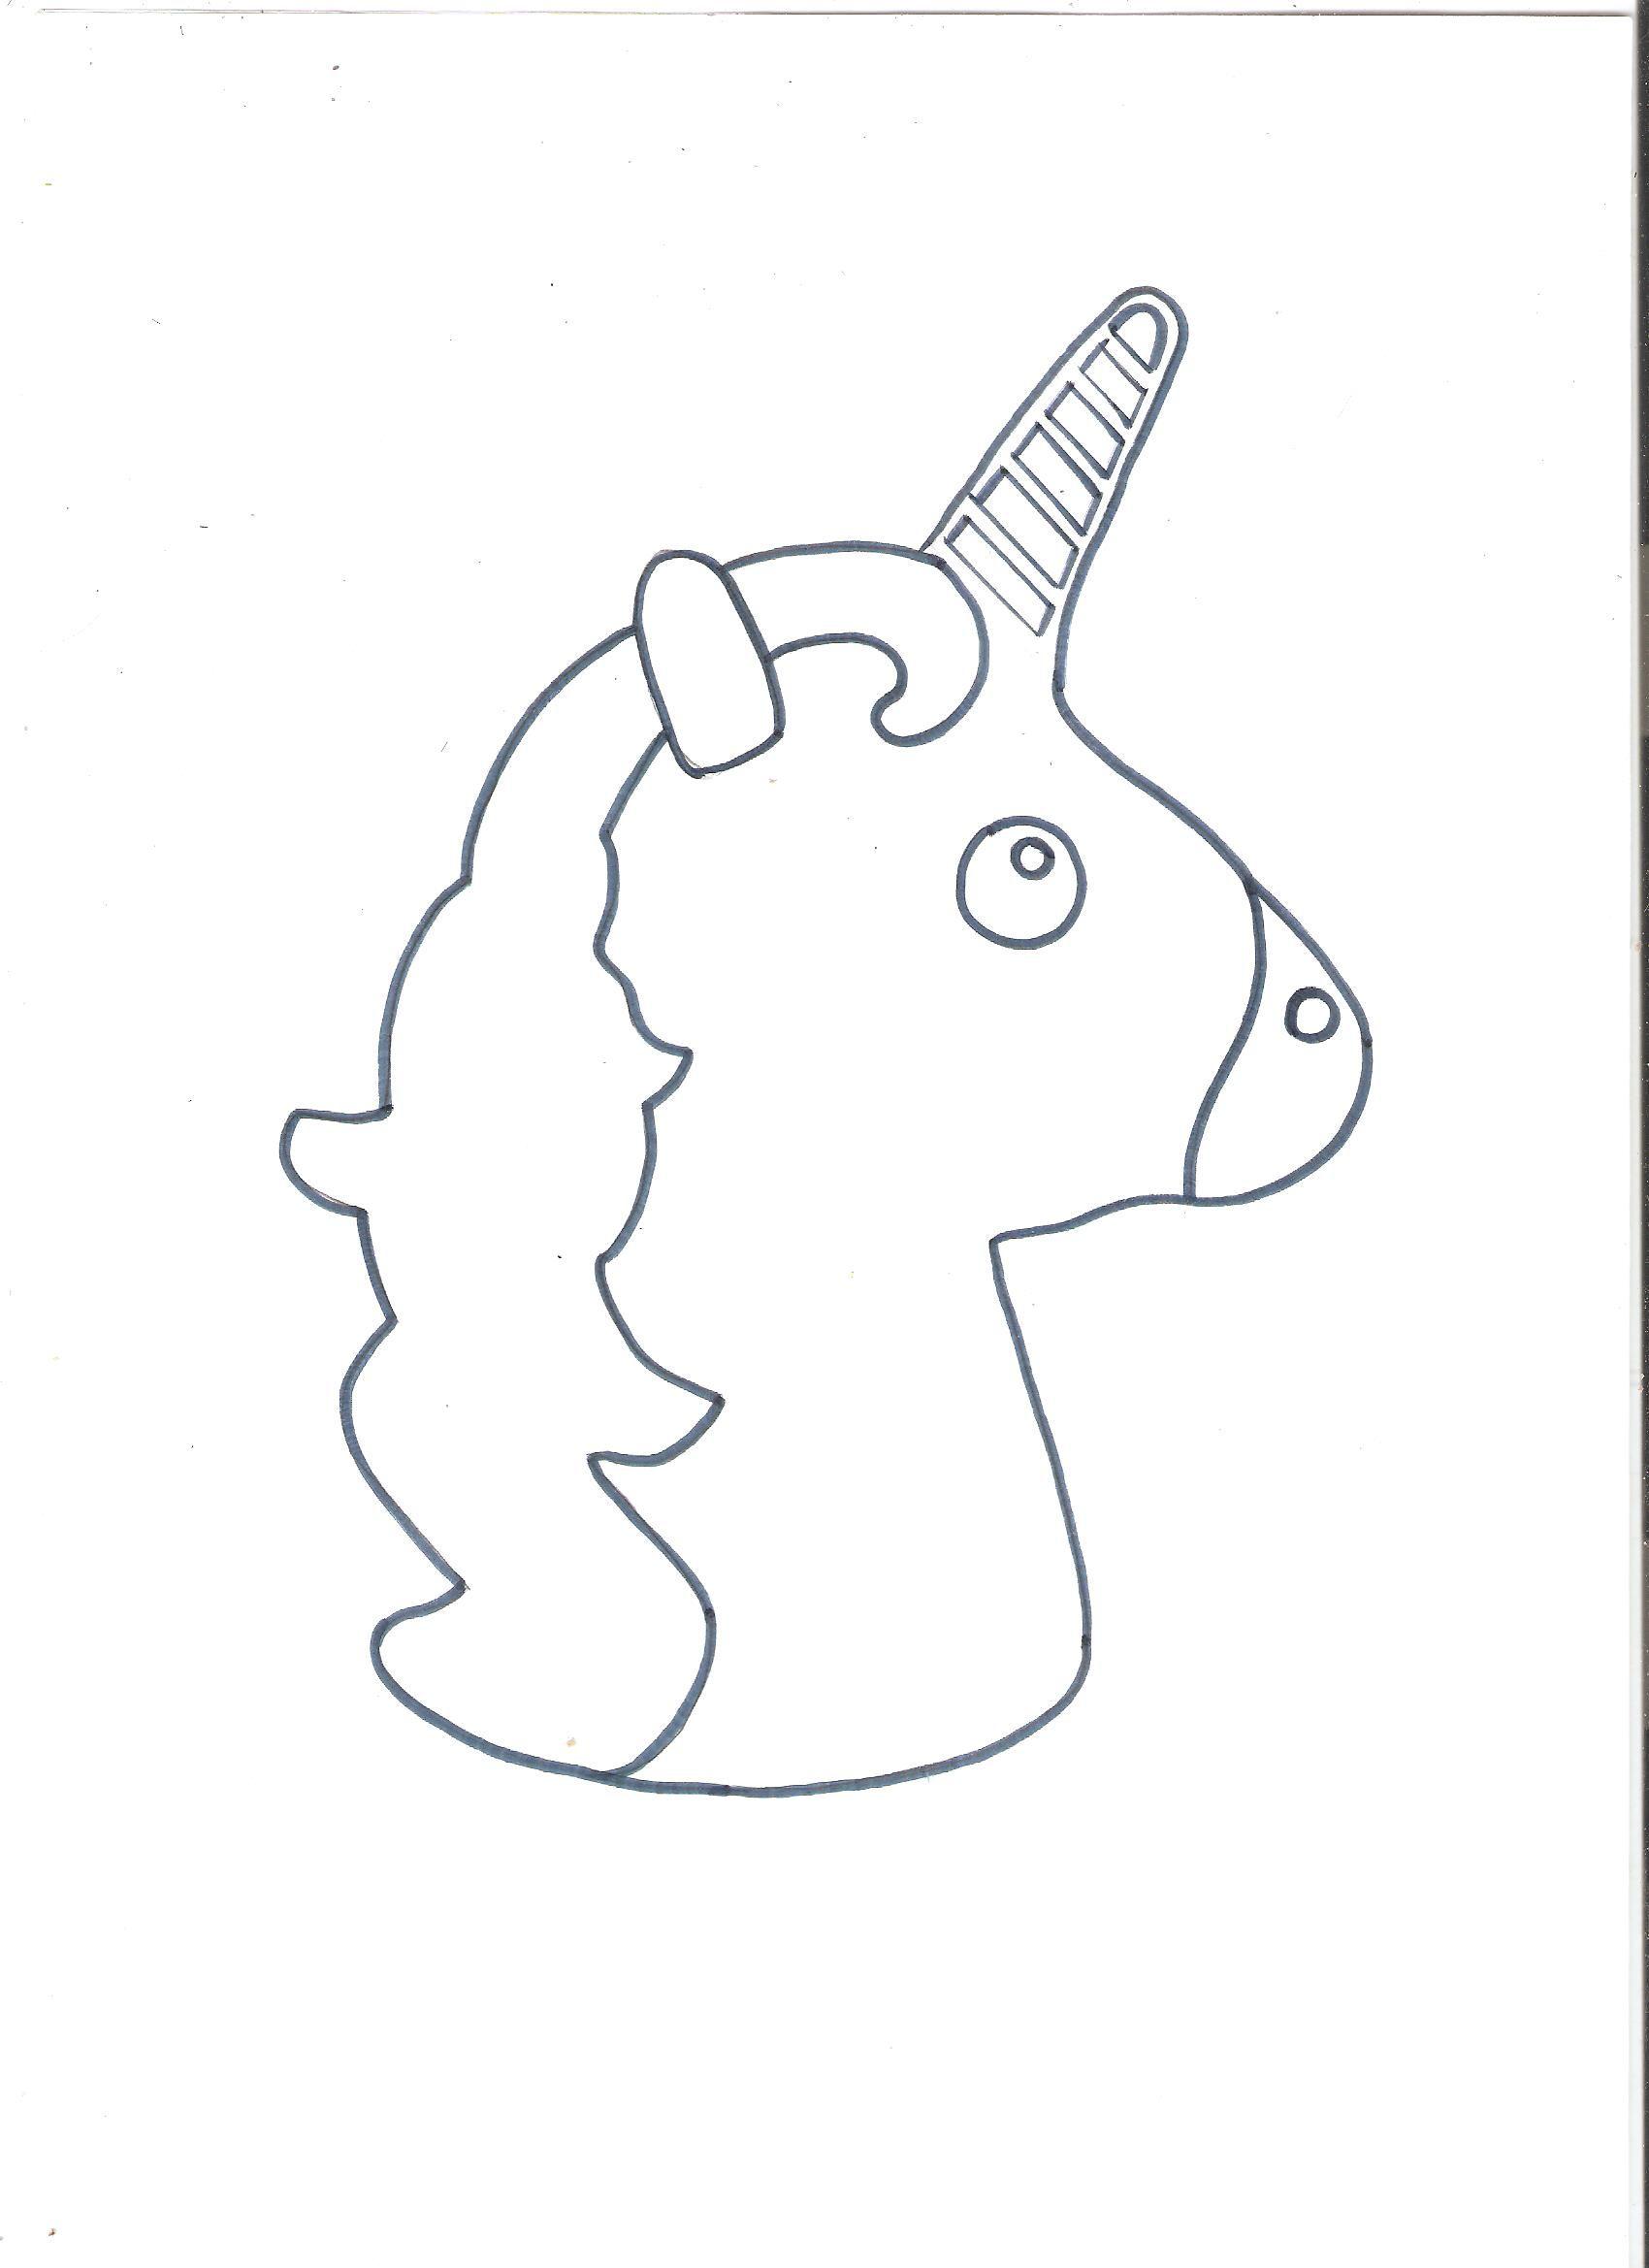 Pin de a26f 92 en Dessin   Pinterest   Unicornio, Unicornios y Ñiños